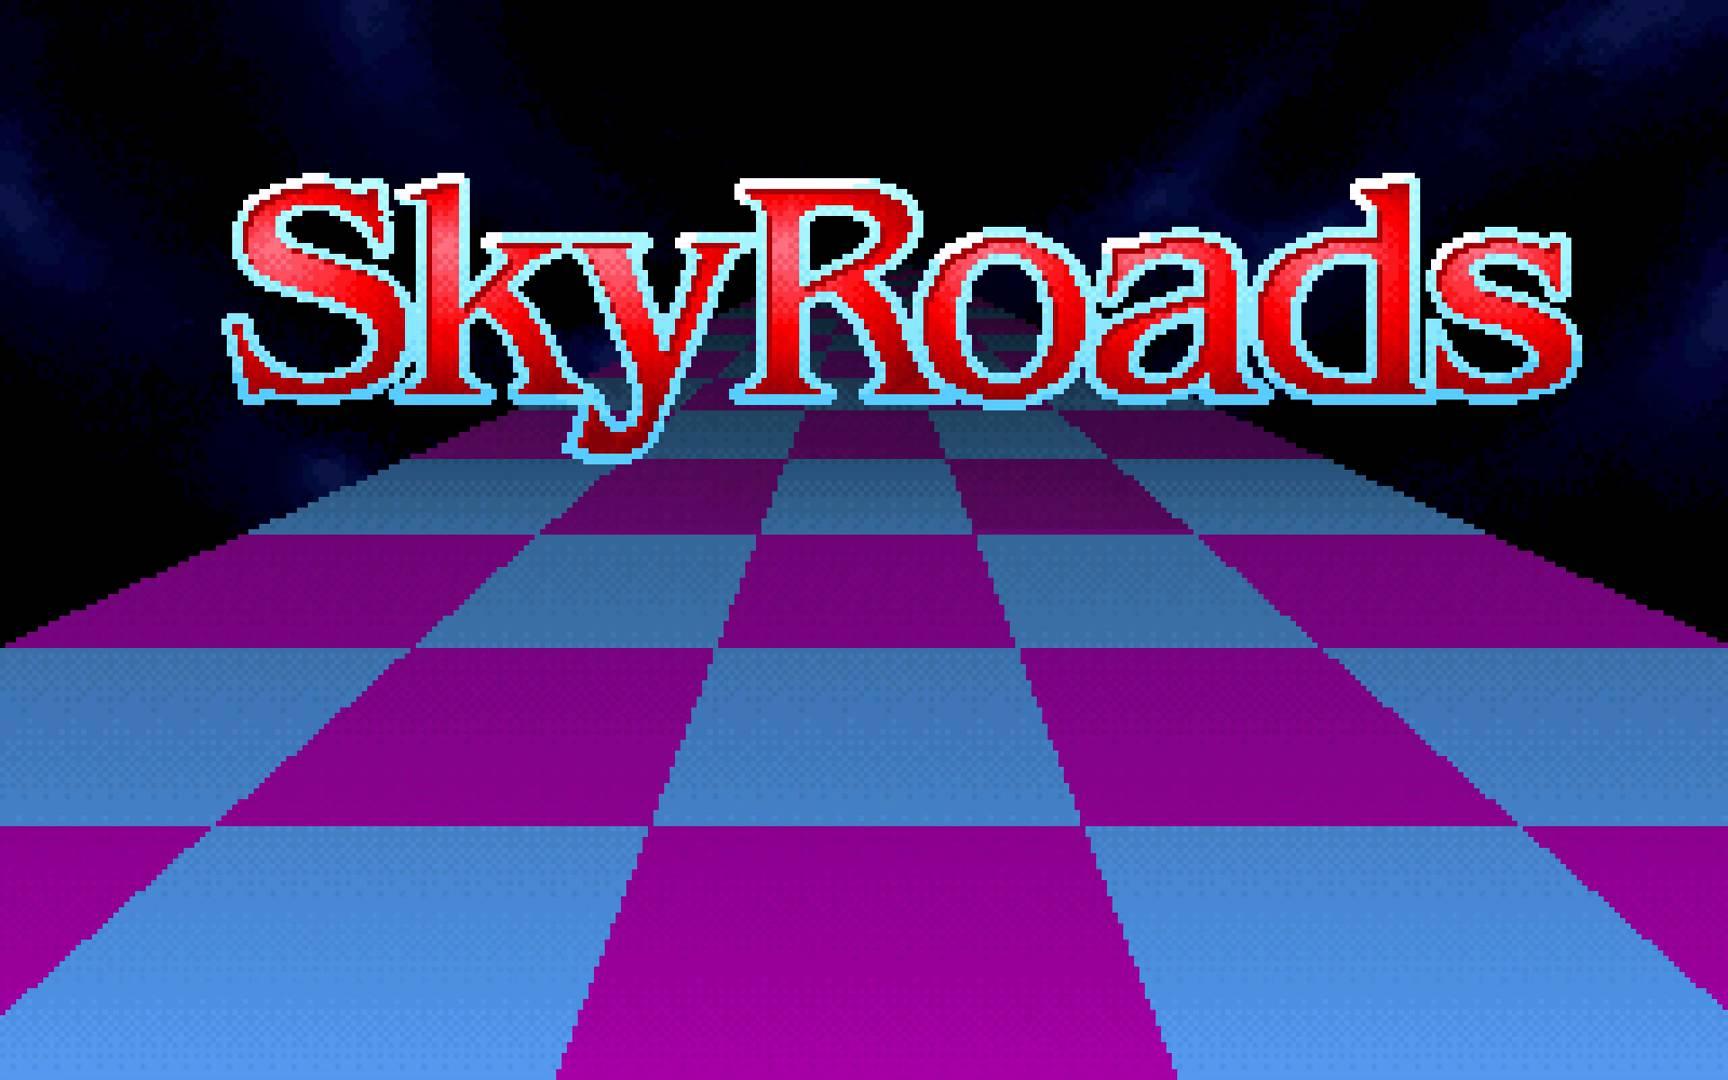 skyroads